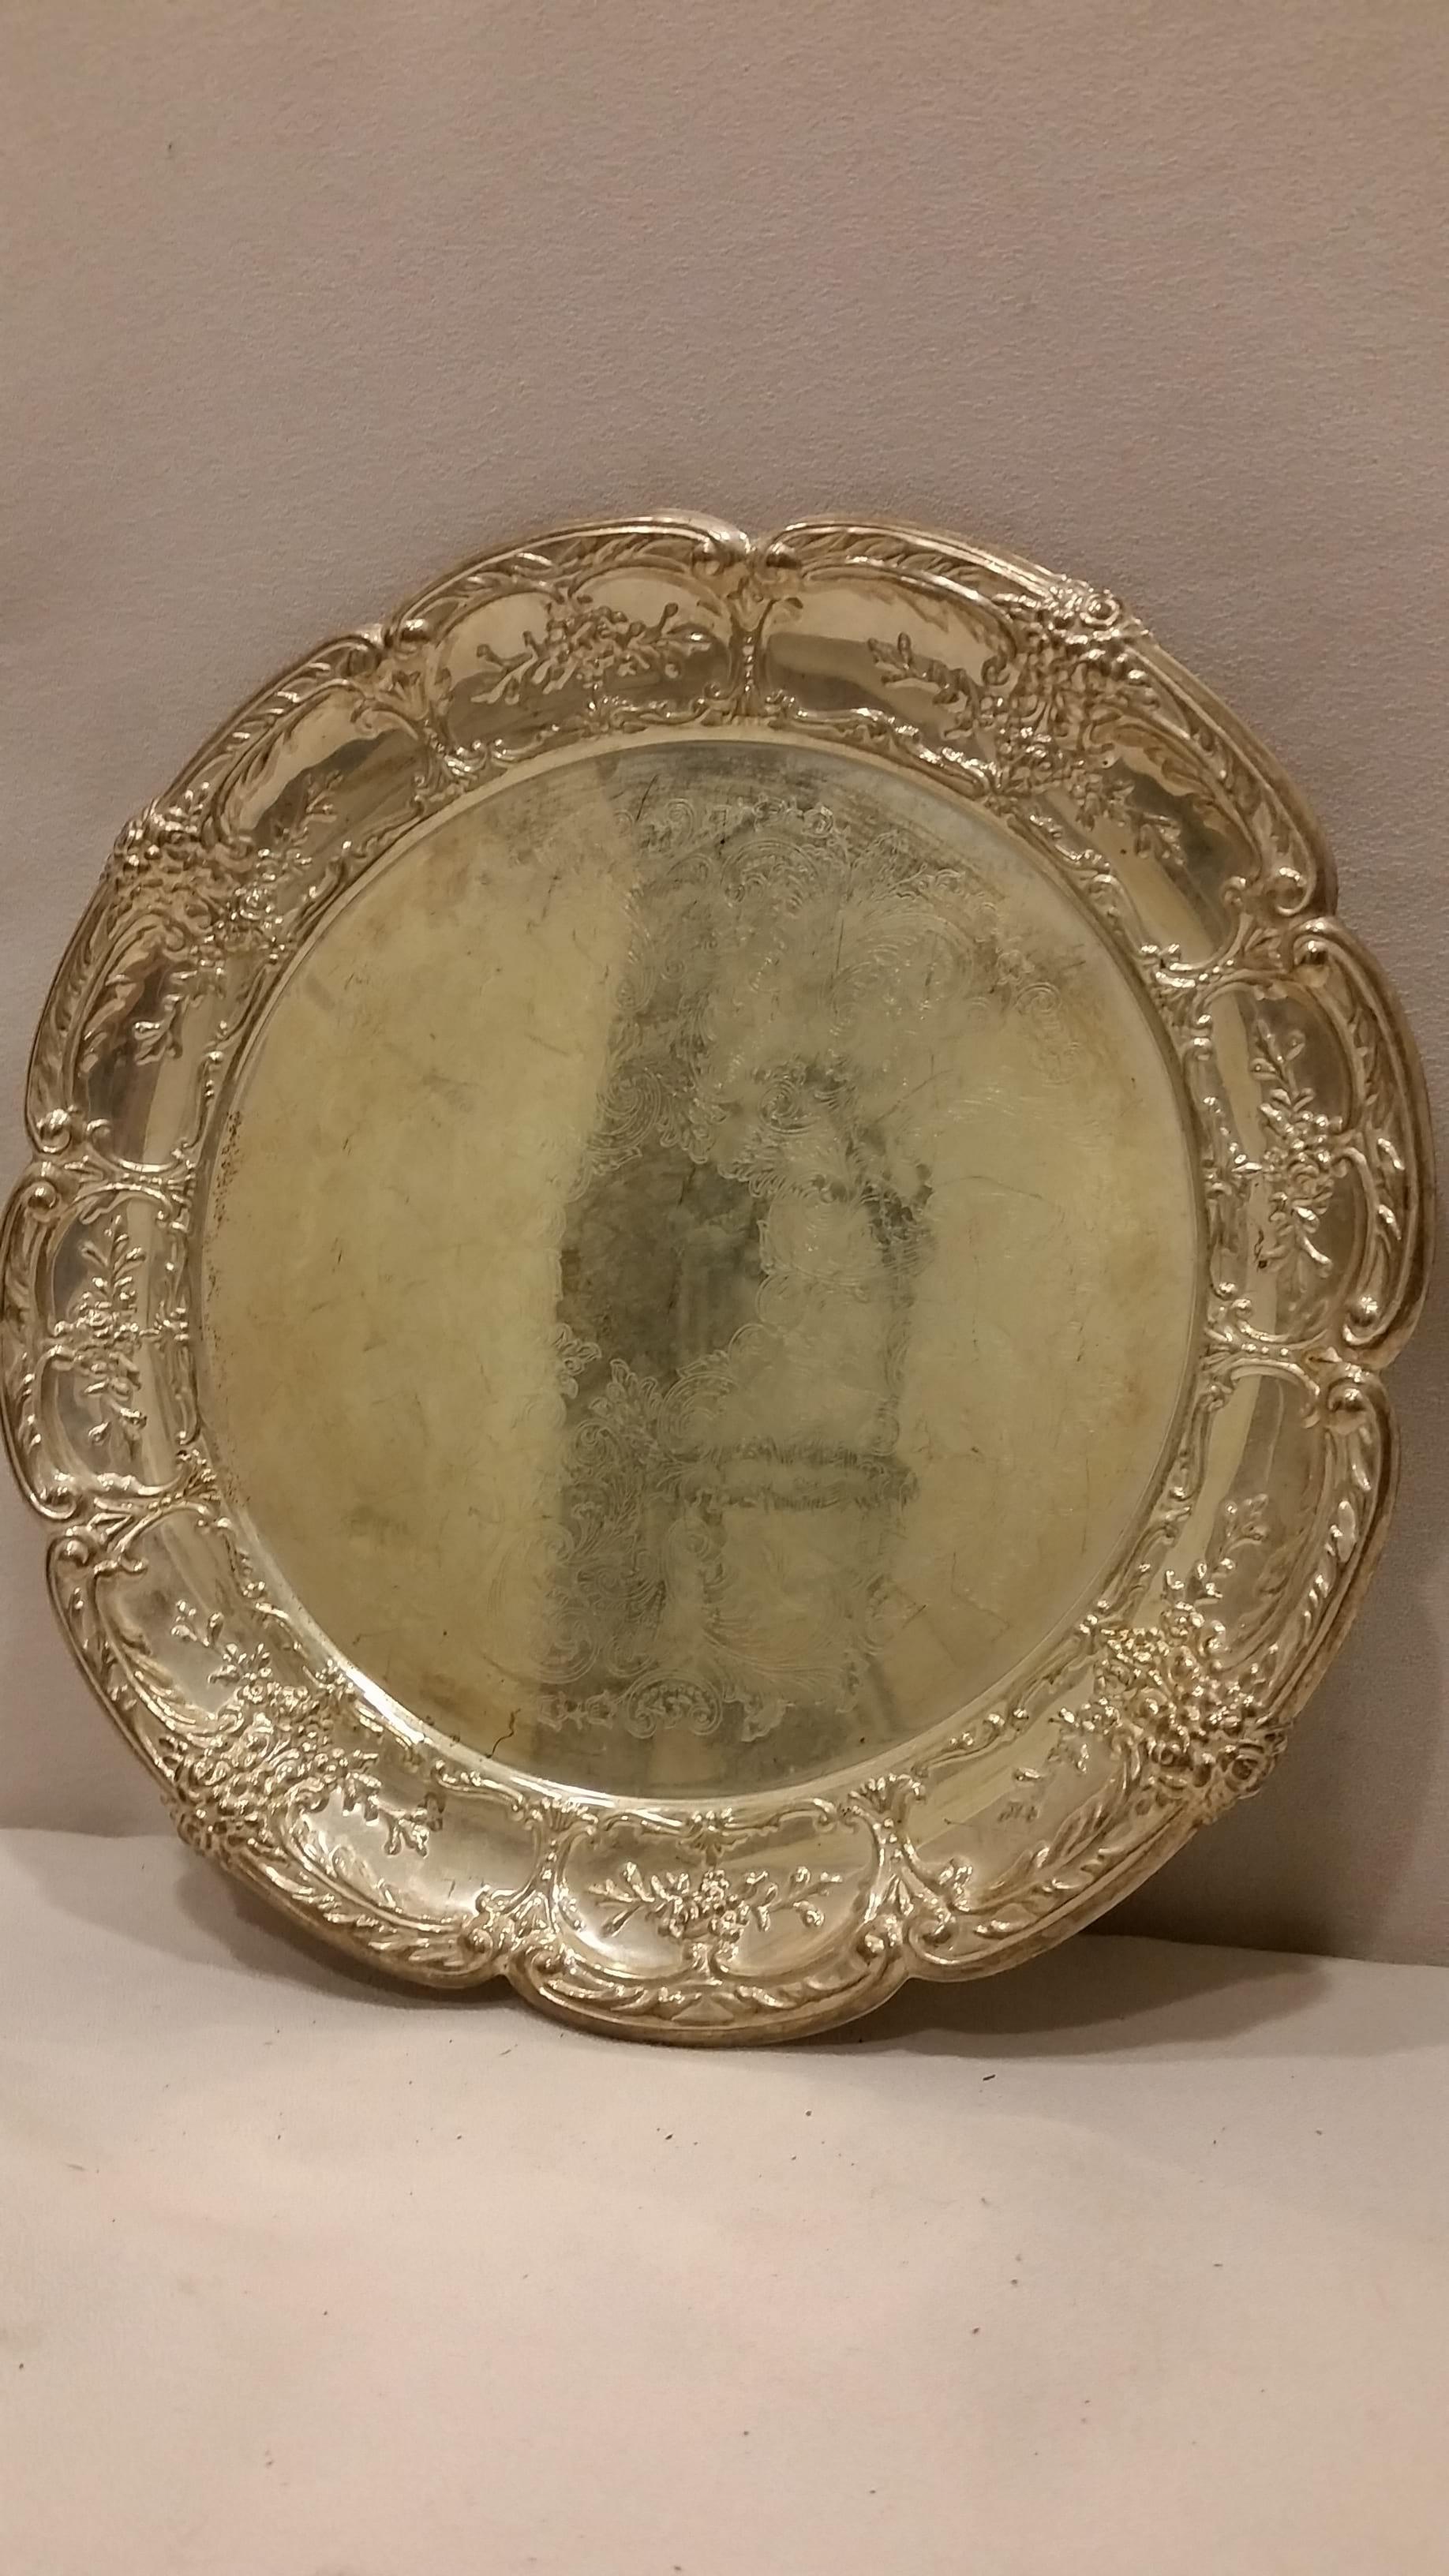 Tray - Silver Medium Floral Edge Plate